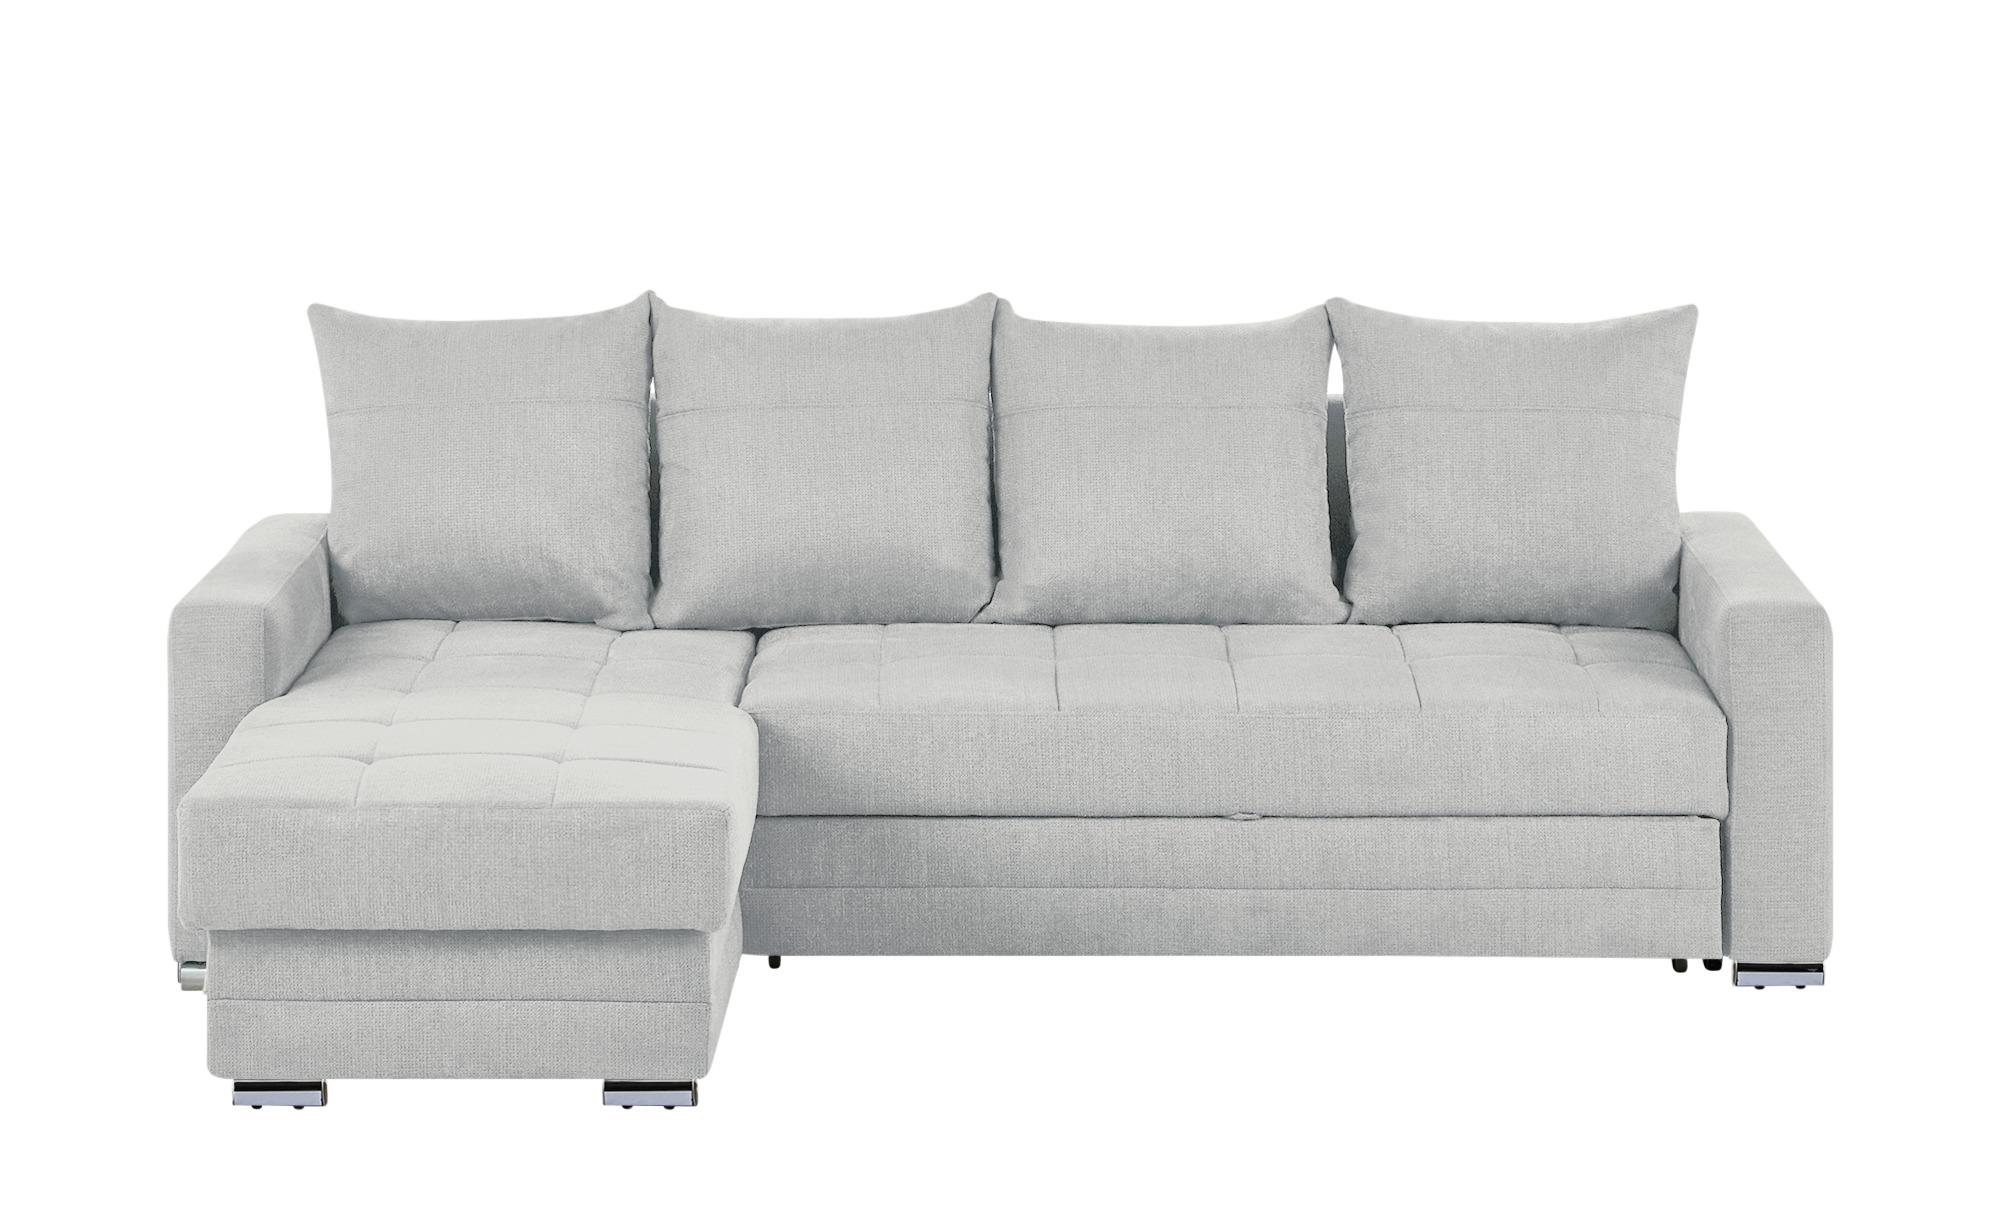 Switch ecksofa ulm breite h he 76 cm grau online kaufen for Ecksofa breite 200 cm